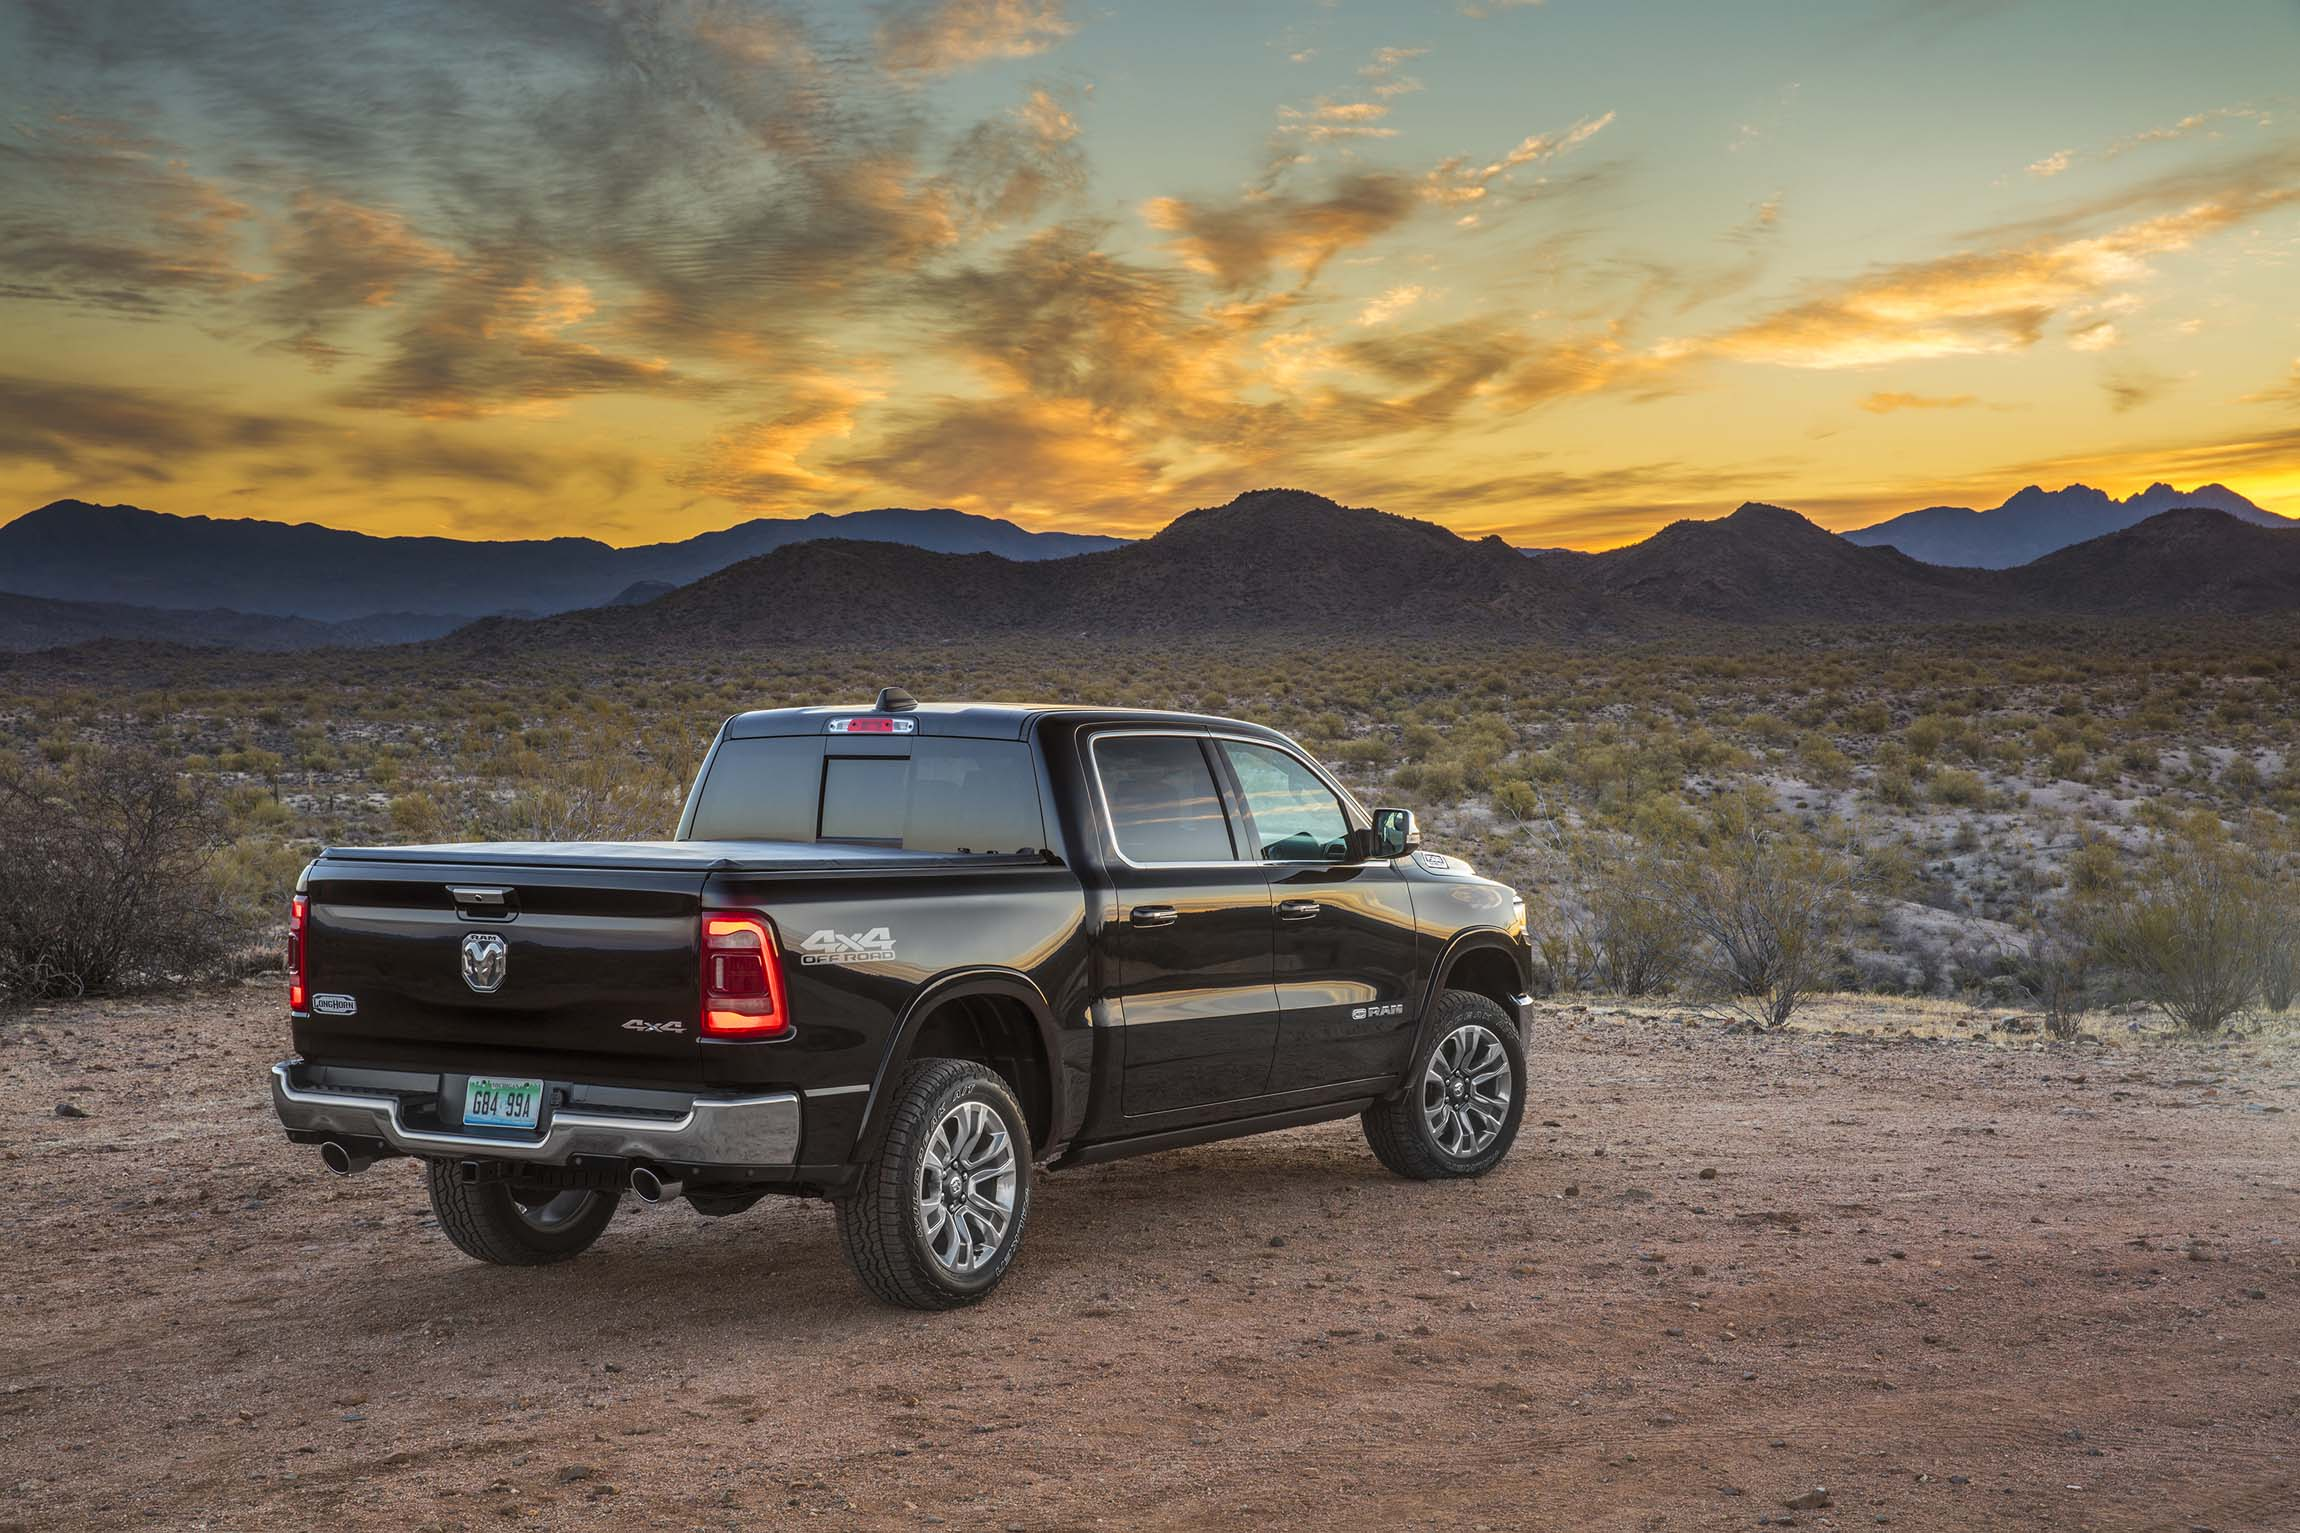 Hybrid Pickup Truck >> 2019 Ram 1500 Etorque First Drive Review The Hybrid Pickup Truck